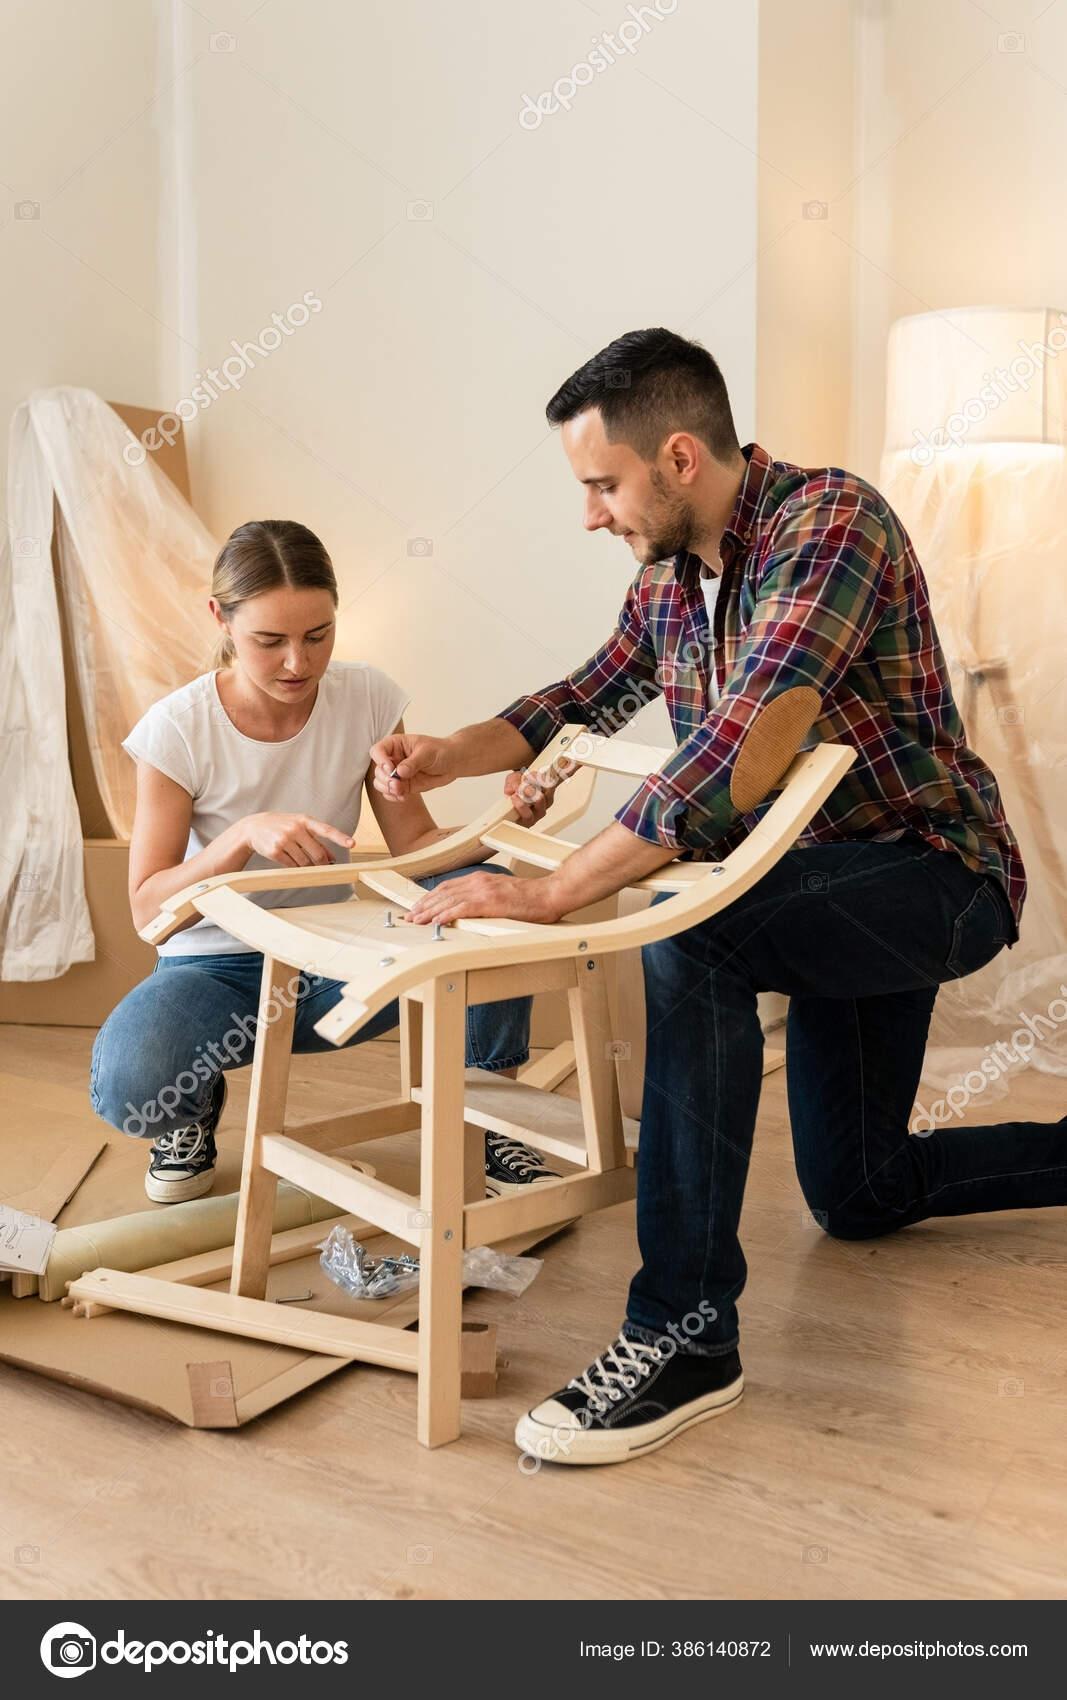 https://st4.depositphotos.com/5970650/38614/i/1600/depositphotos_386140872-stock-photo-happy-smiling-couple-collects-furniture.jpg